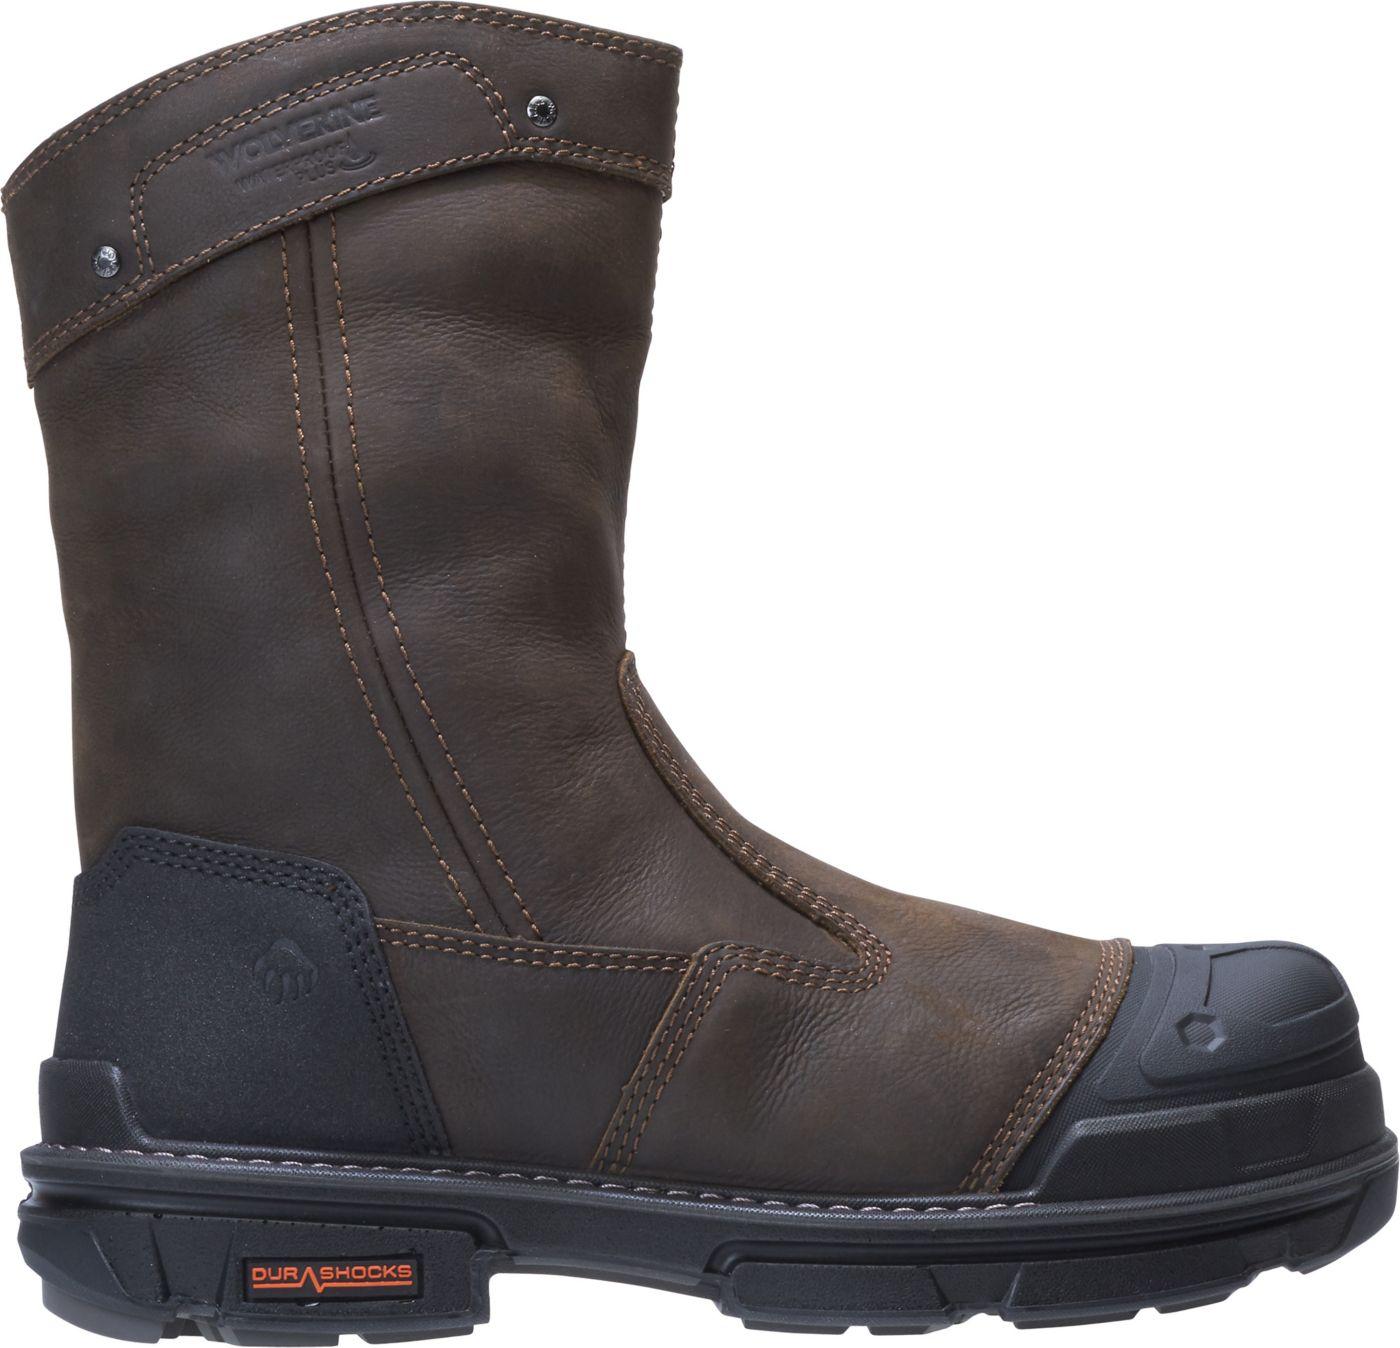 Wolverine Men's Yukon Wellington Waterproof Composite Toe Work Boots